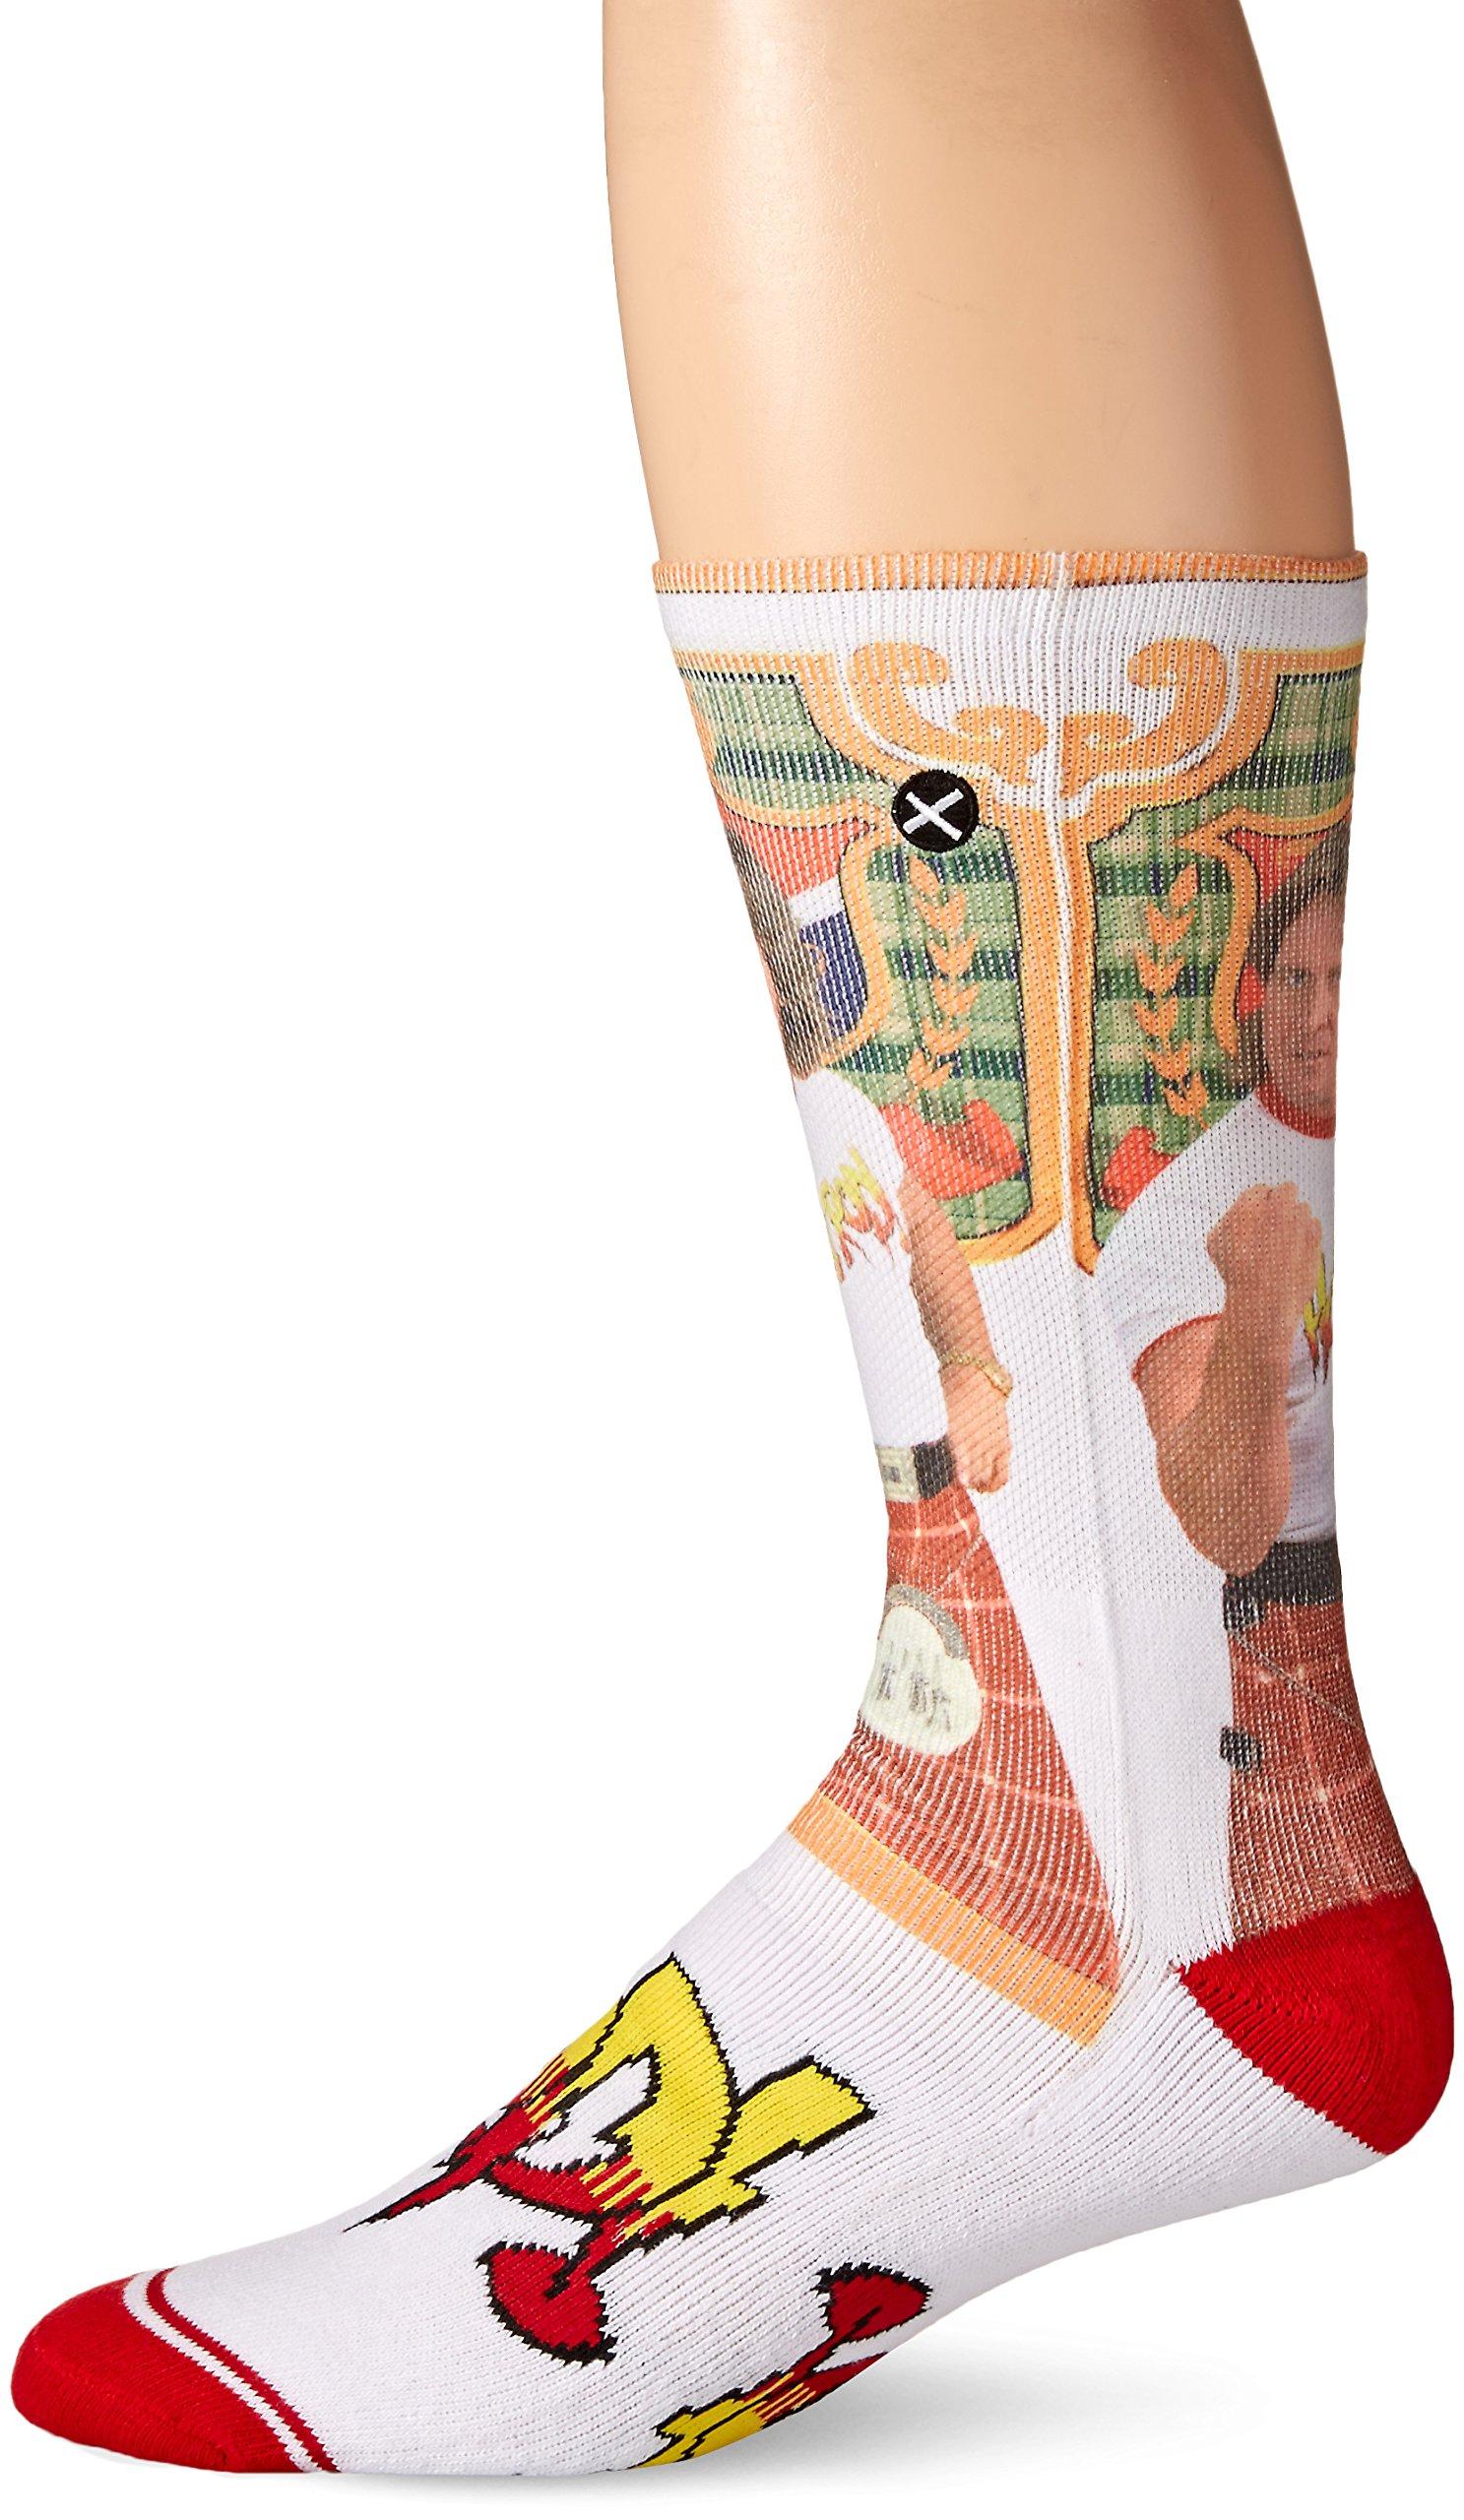 Odd Sox Men's Hot Rod, Multi, Sock Size:10-13/Shoe Size: 6-12